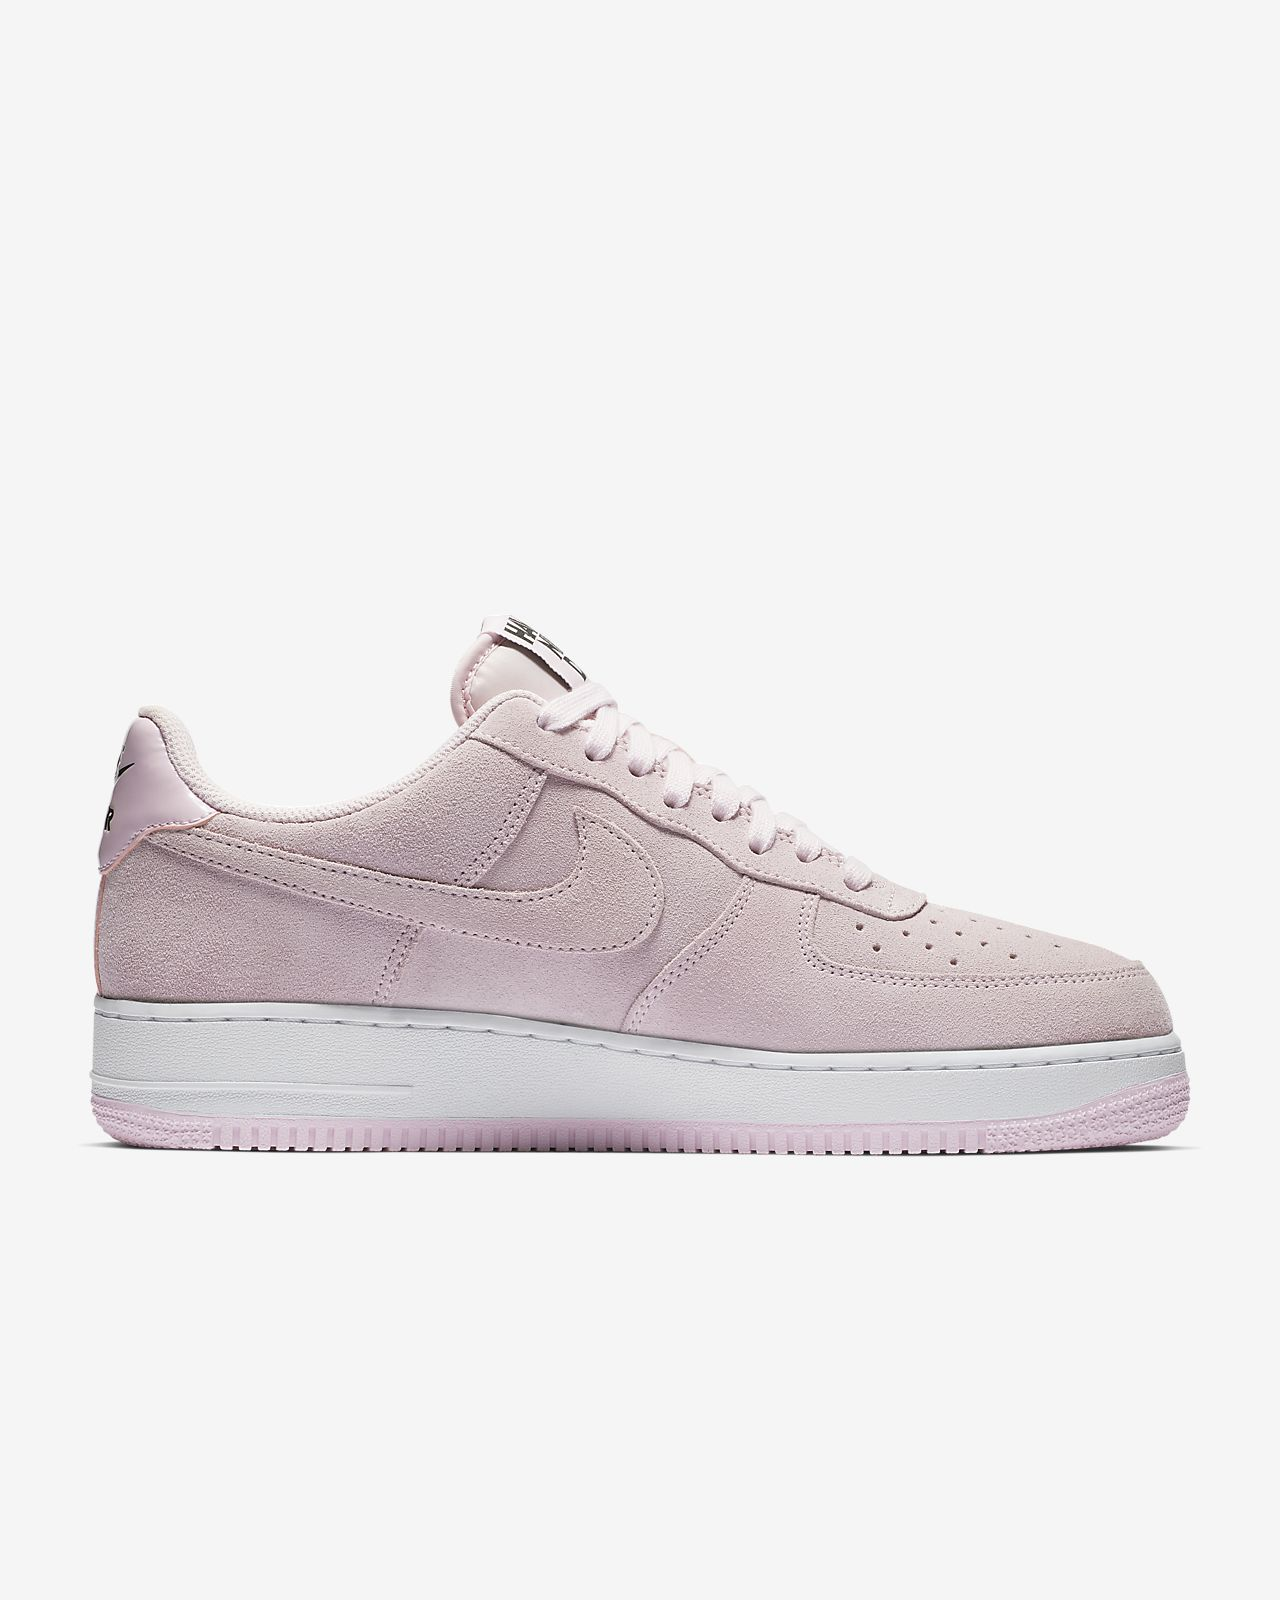 best service 4f861 250d9 ... Nike Air Force 1  07 LV8 ND Men s Shoe